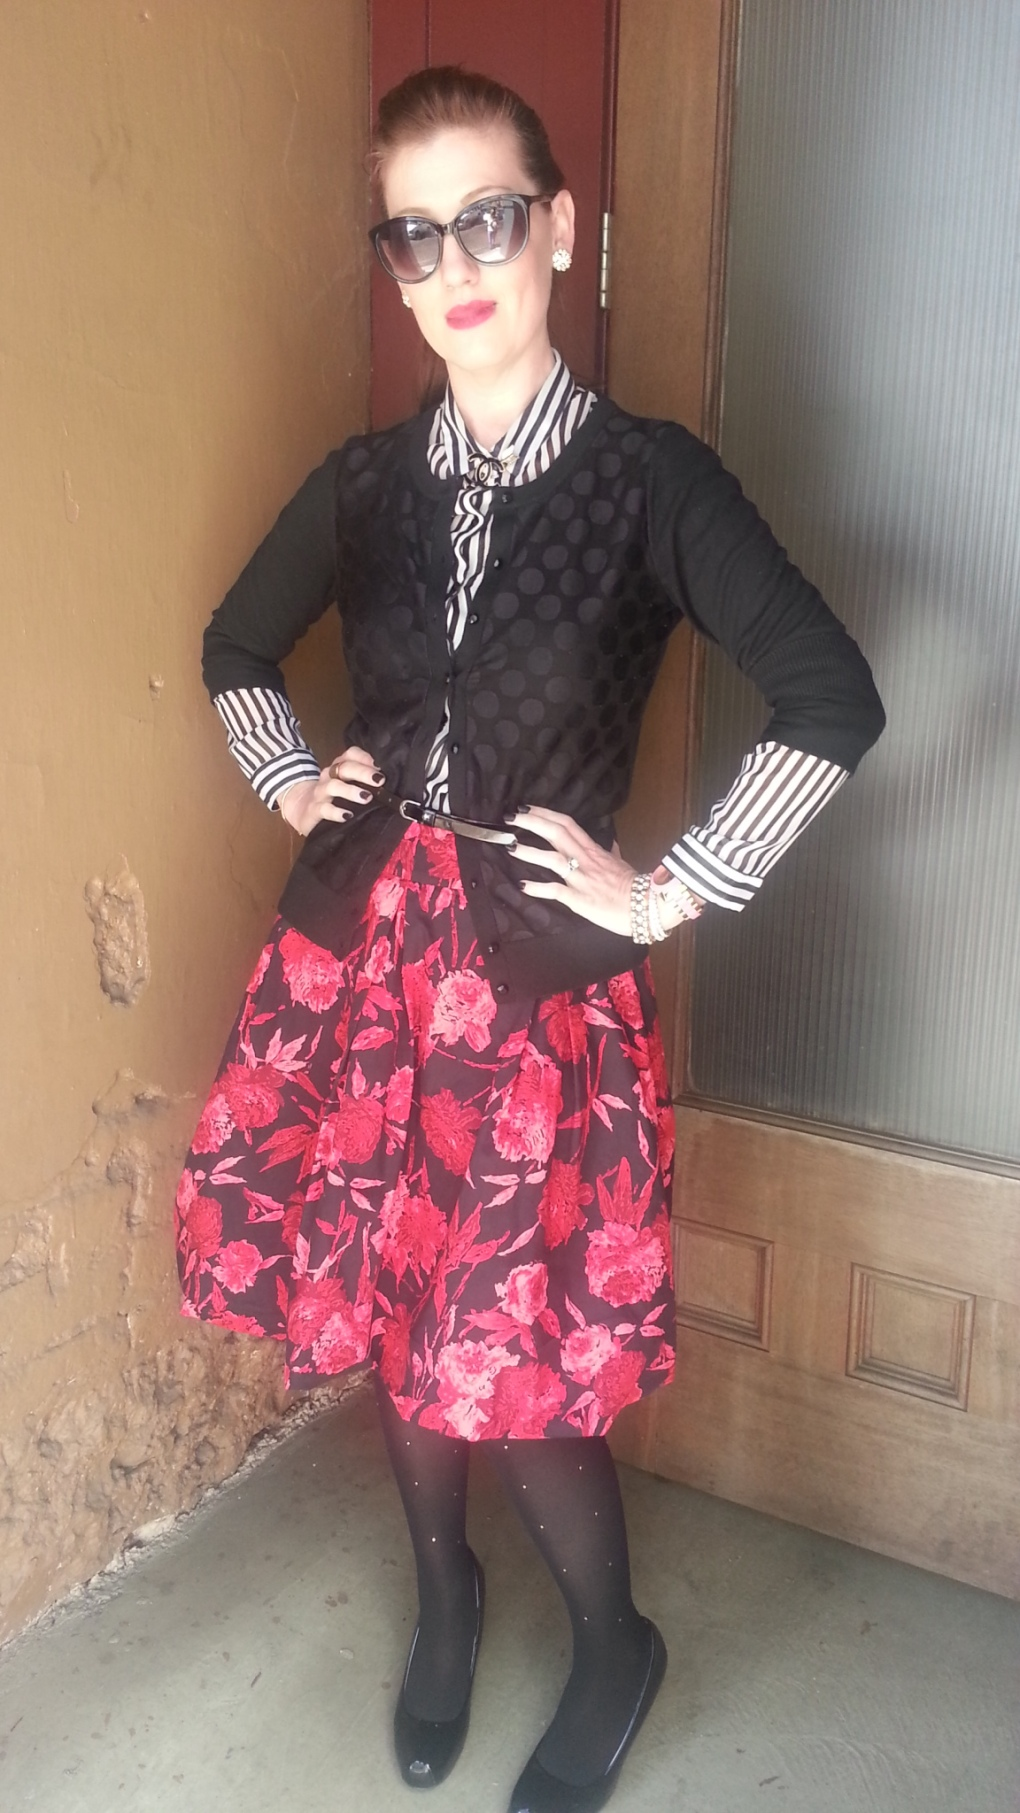 Blouse: Gap Cardigan: Banana Republic Skirt: New York and Co Tights: Merona Shoes: Mossimo Pin: Chanel Watch/Earrings: Kate Spade Sunglasses: Colehaan